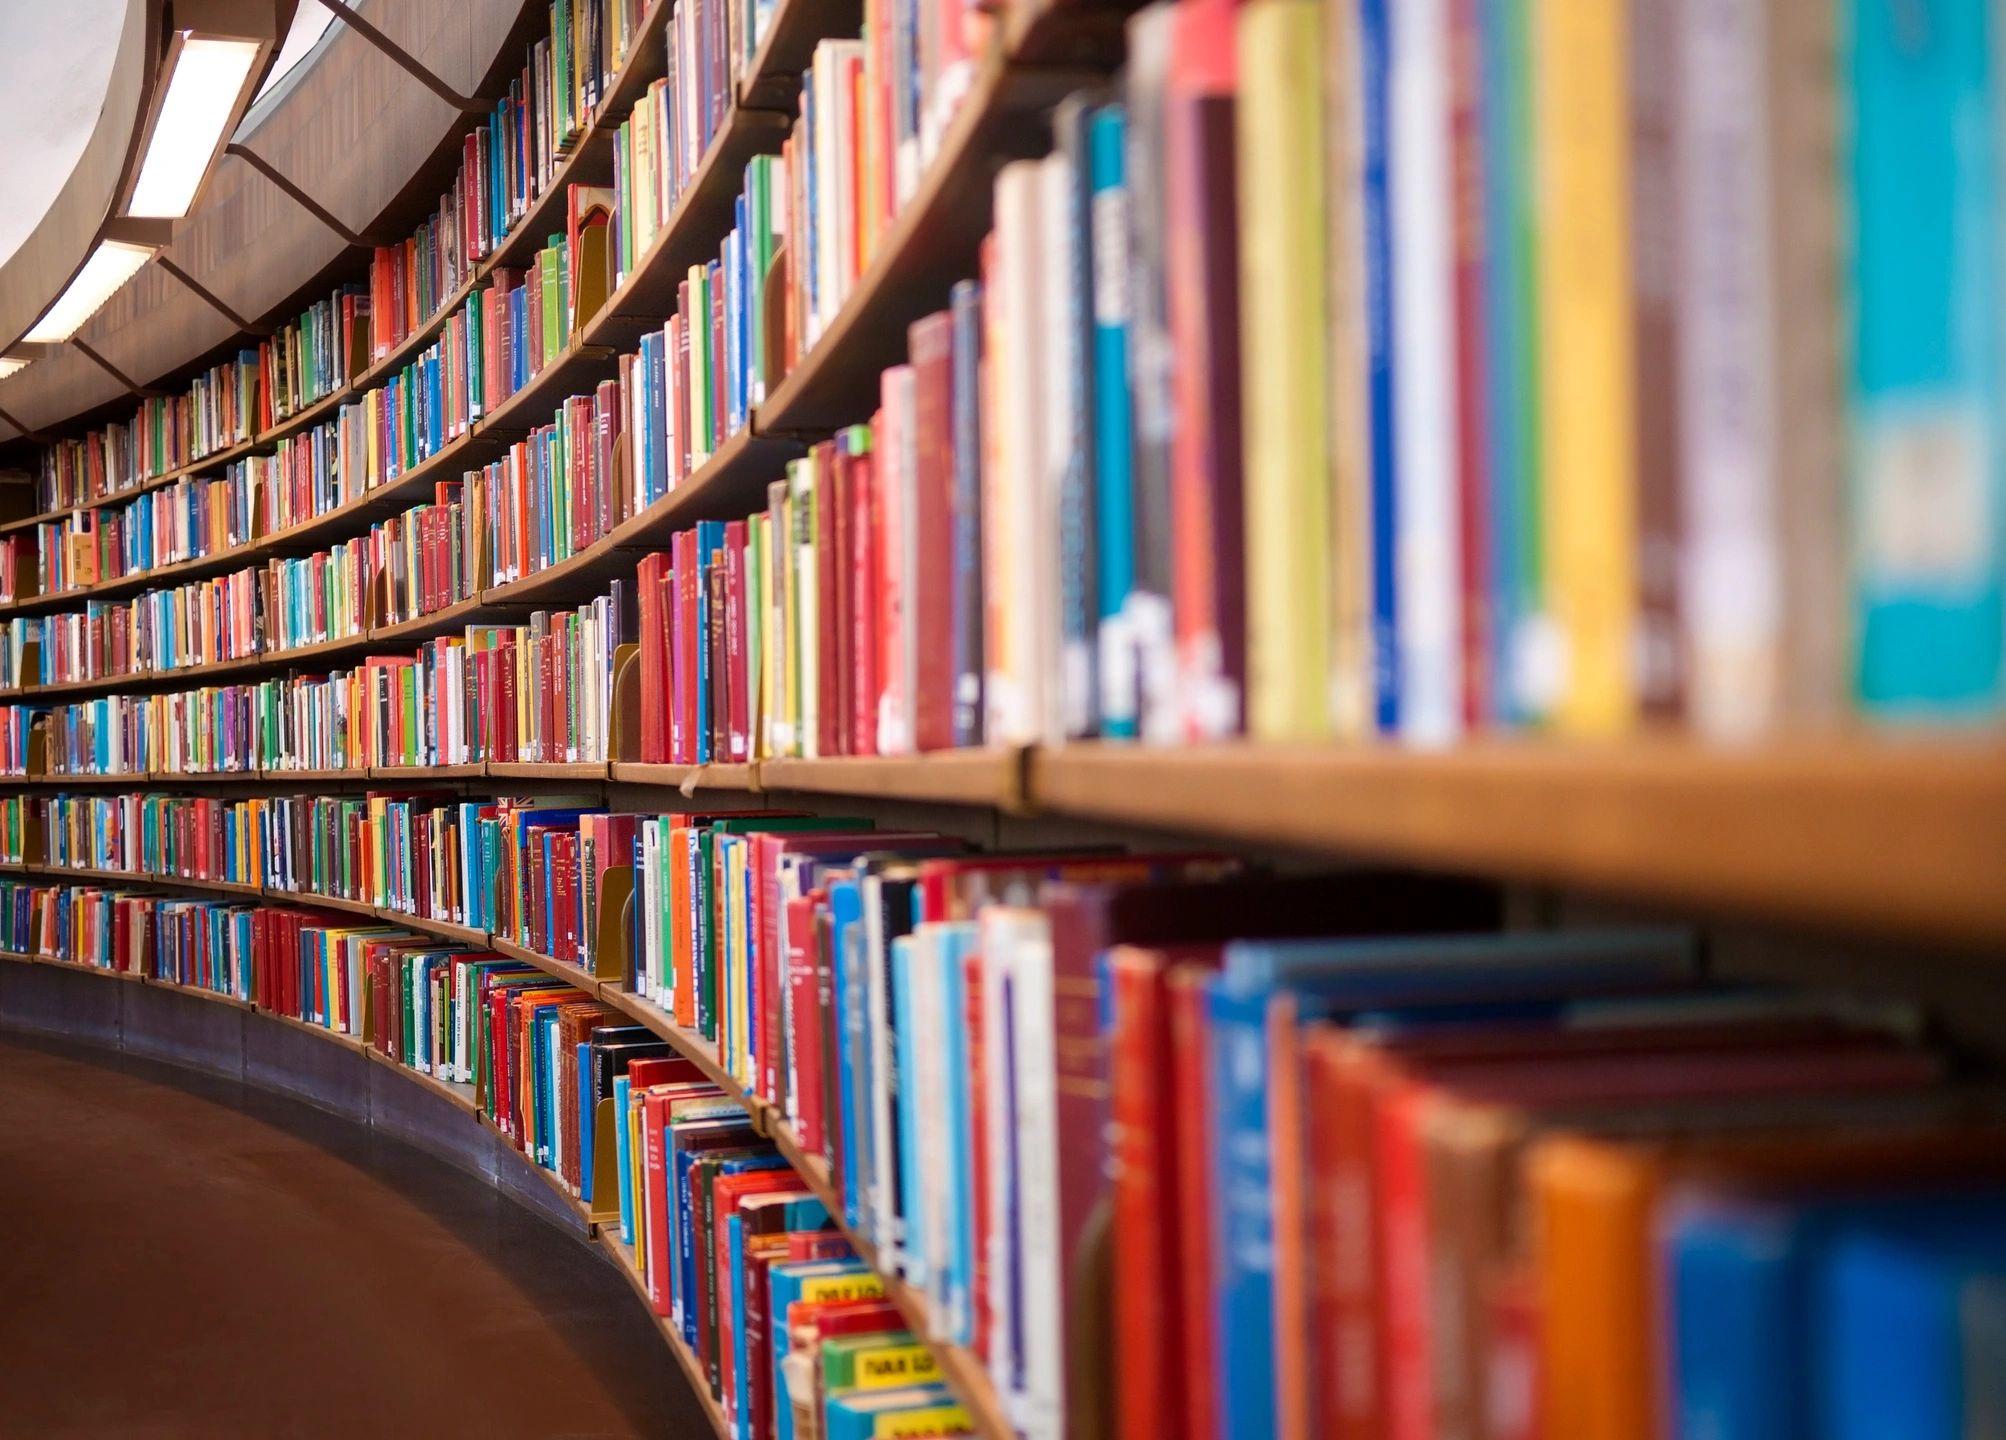 Tuxedo Park Library